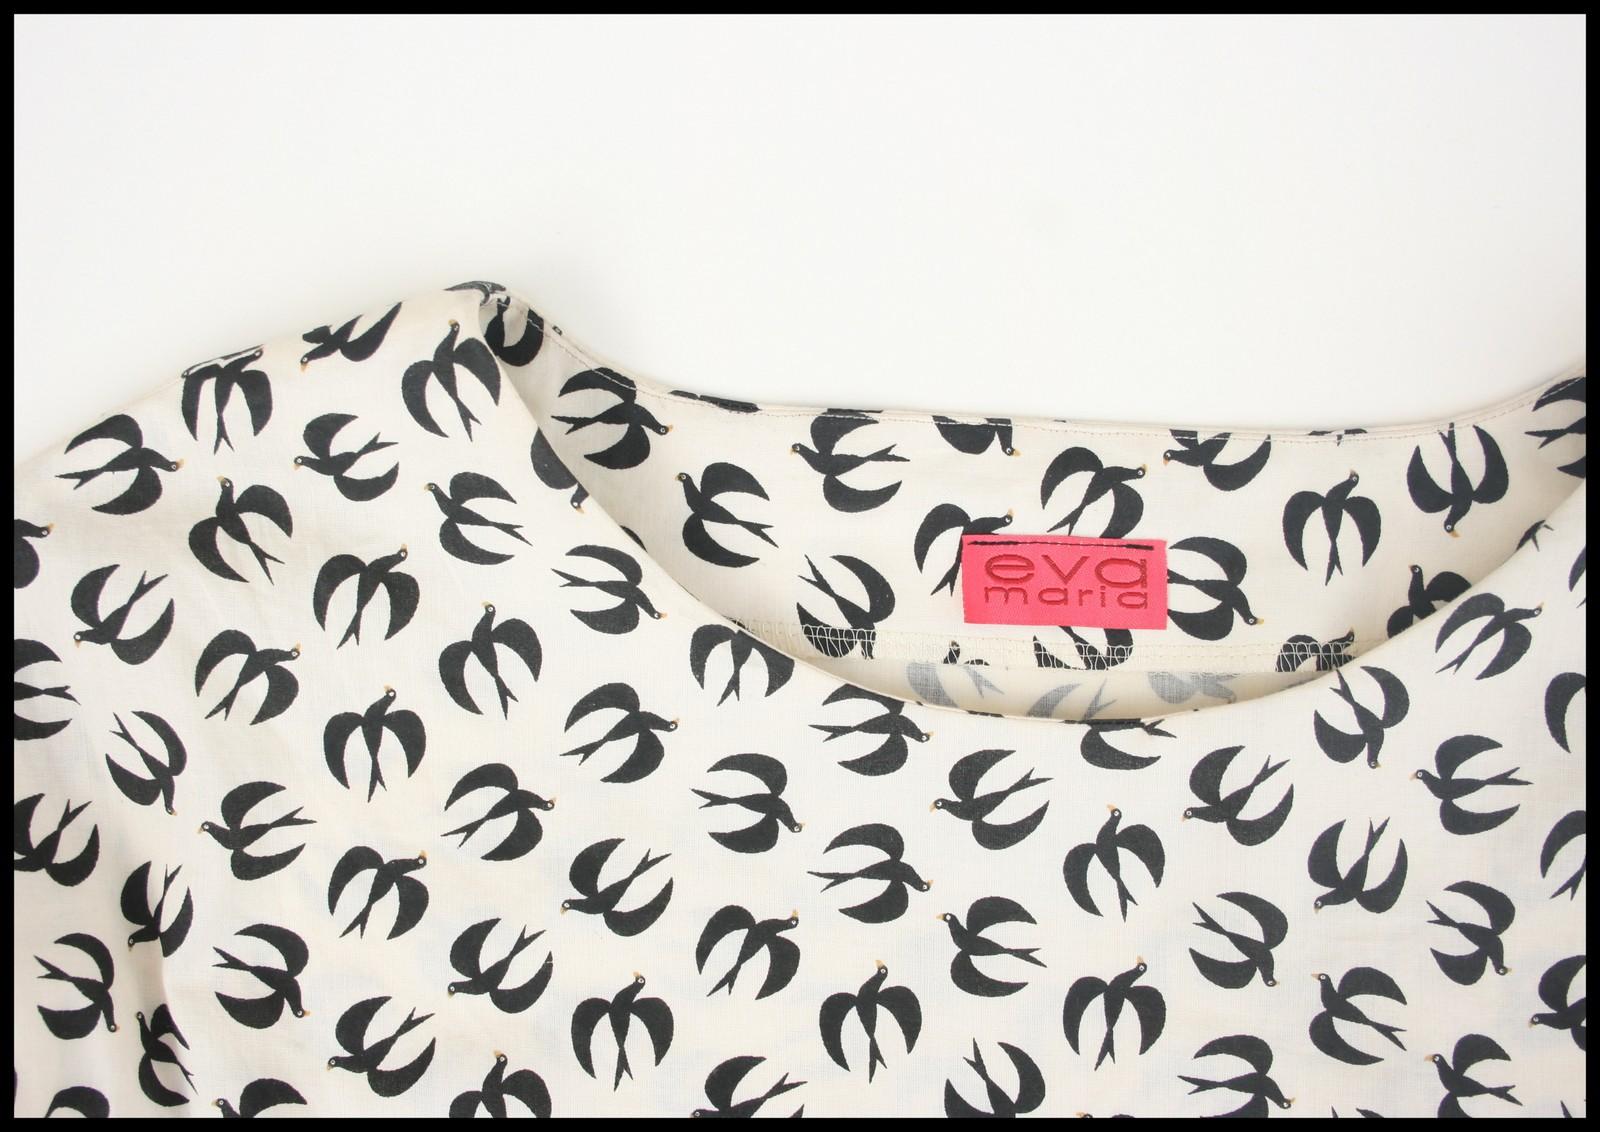 zwaluwjurk (detail)